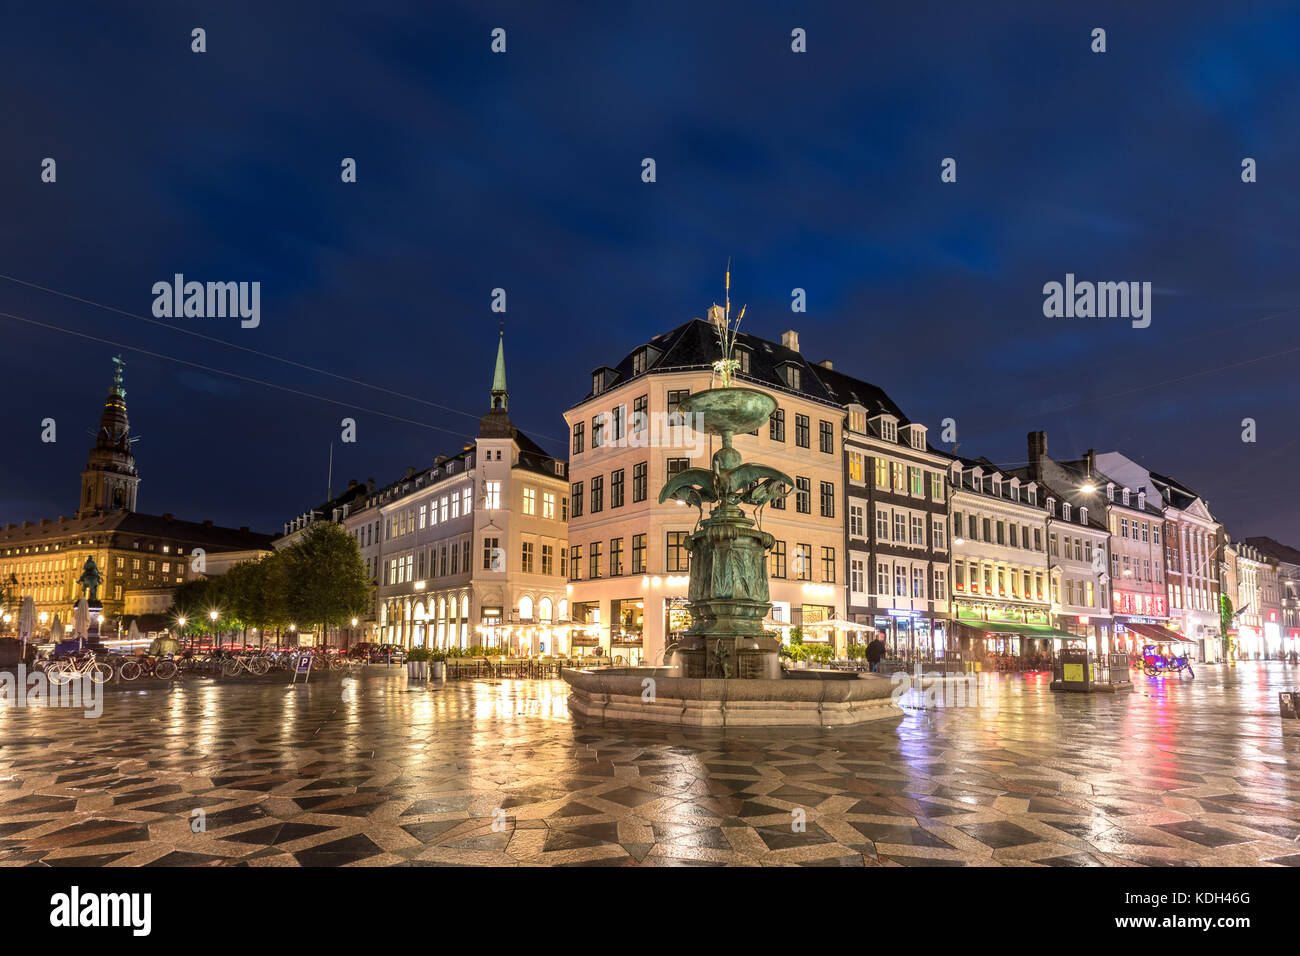 Scenic summer view of  the Old Town of Copenhagen, Denmark Stock Photo